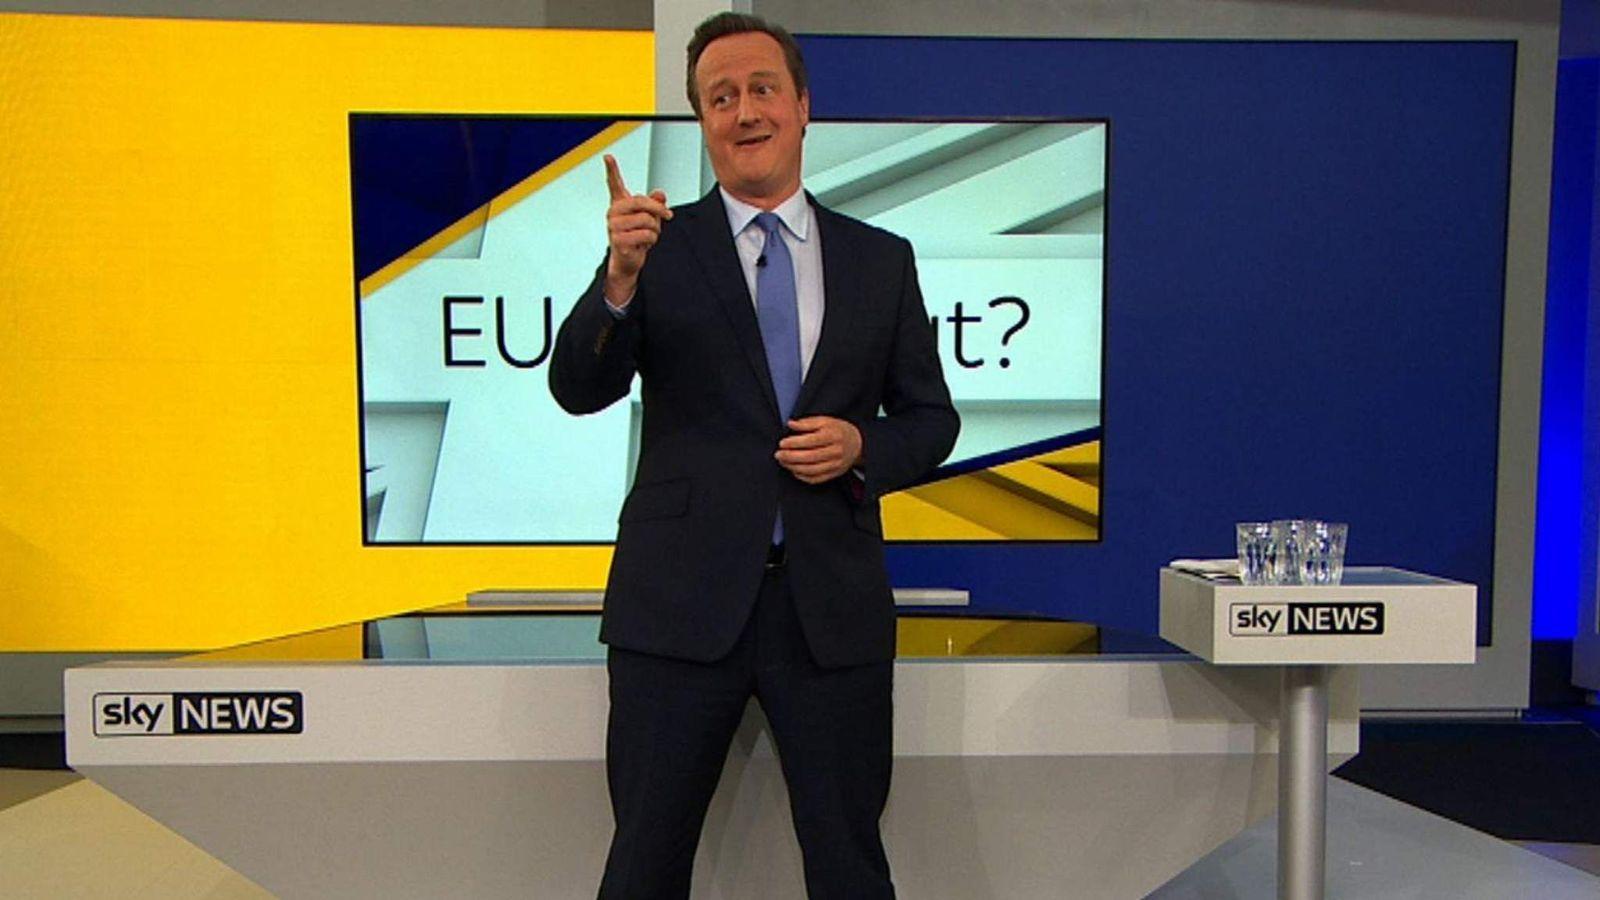 David Cameron addresses a question about the EU referendum